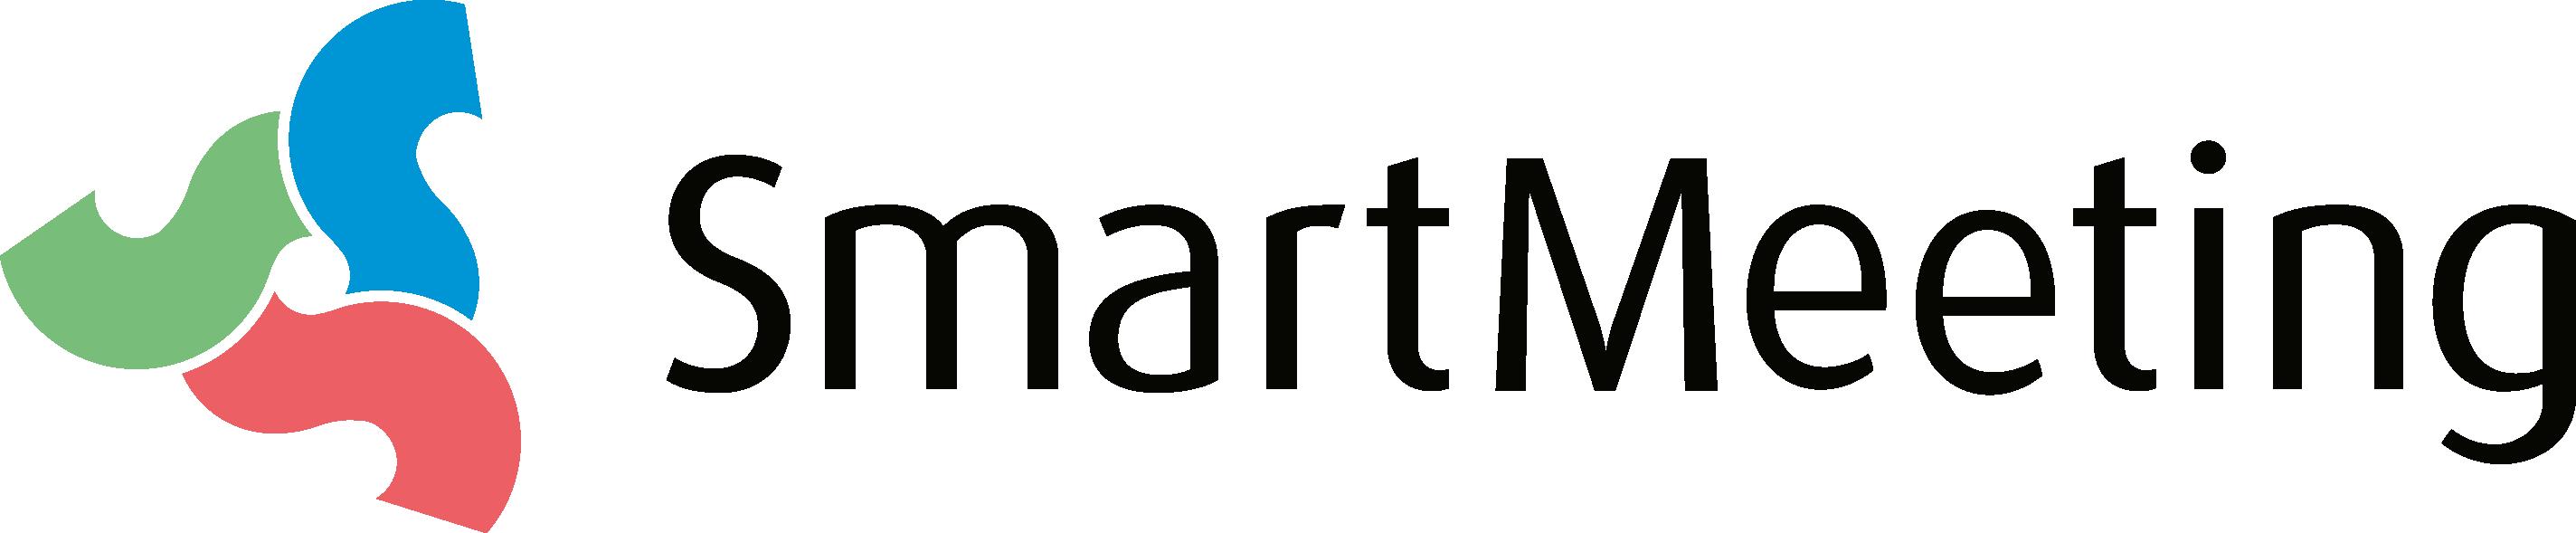 rz_smart_meeting_logo_word-sign_landscape_4c